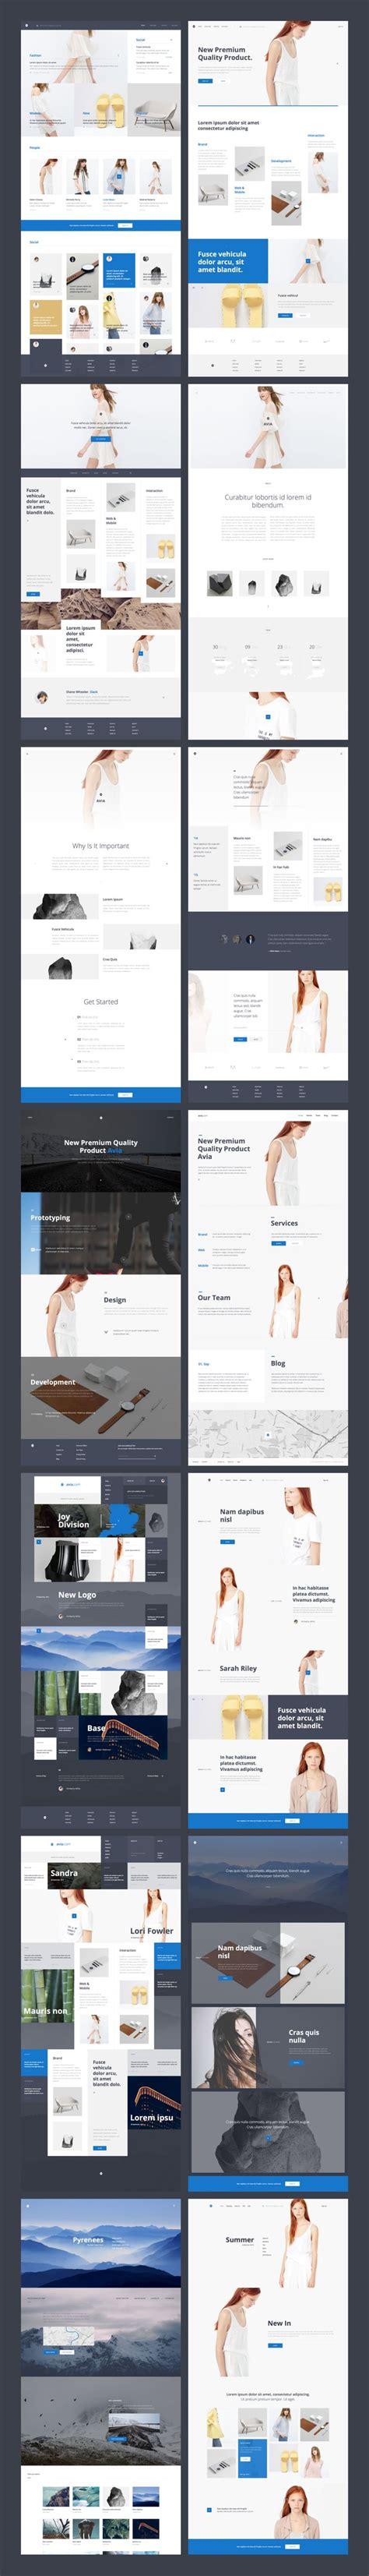 wordpress avia layout avia ui kit digital design pinterest products and ui kit